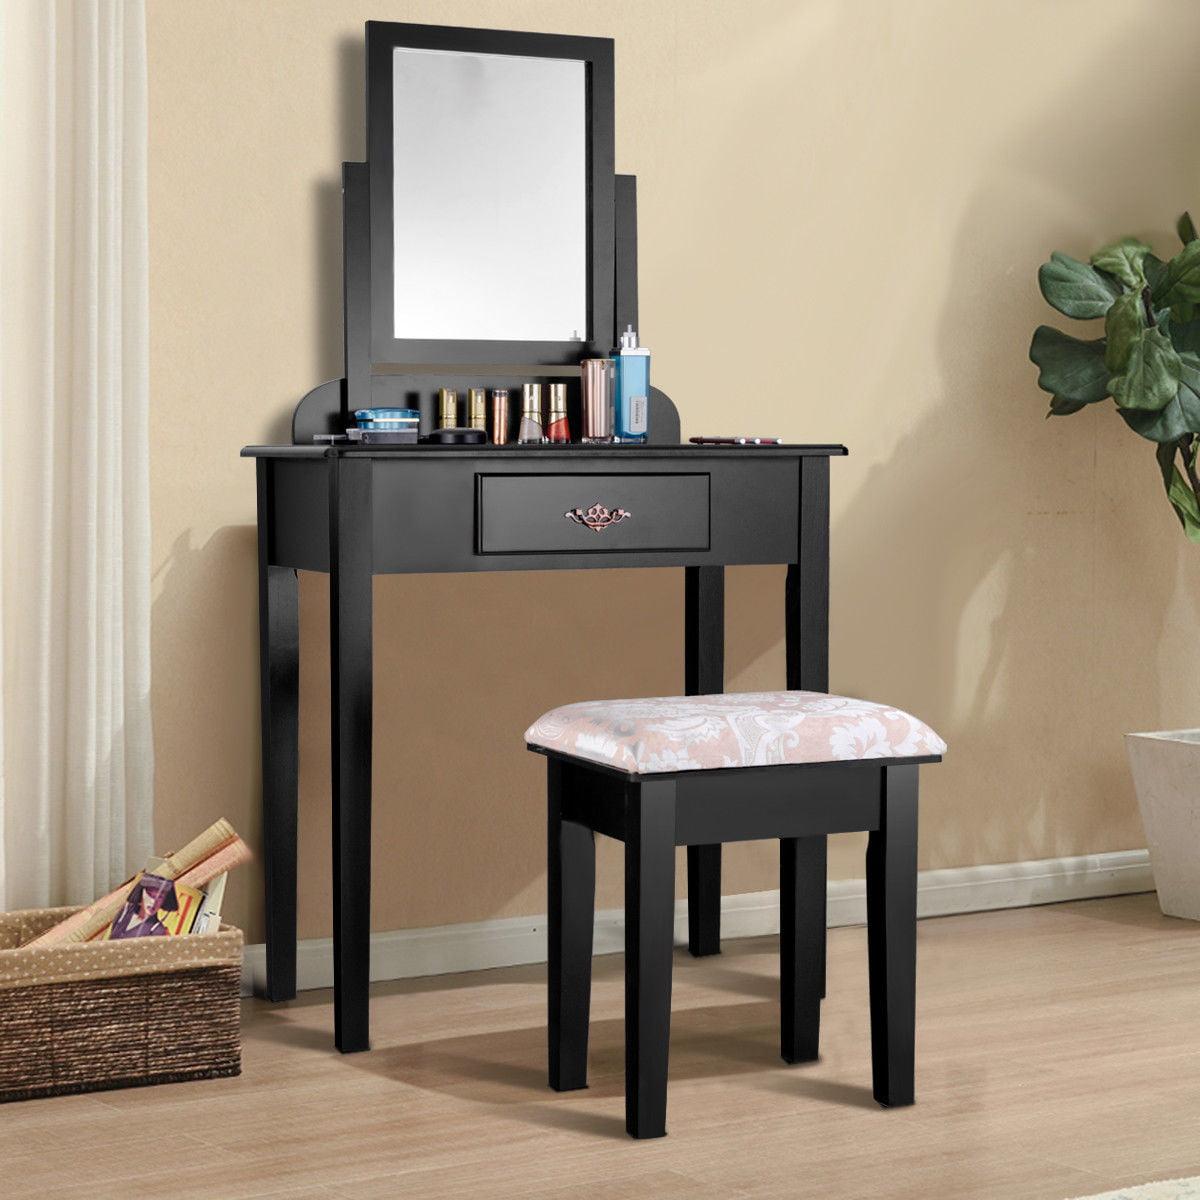 Costway Makeup Desk Vanity Dressing Table Set W Square Mirror Stool 1 Large Drawer Black by Costway